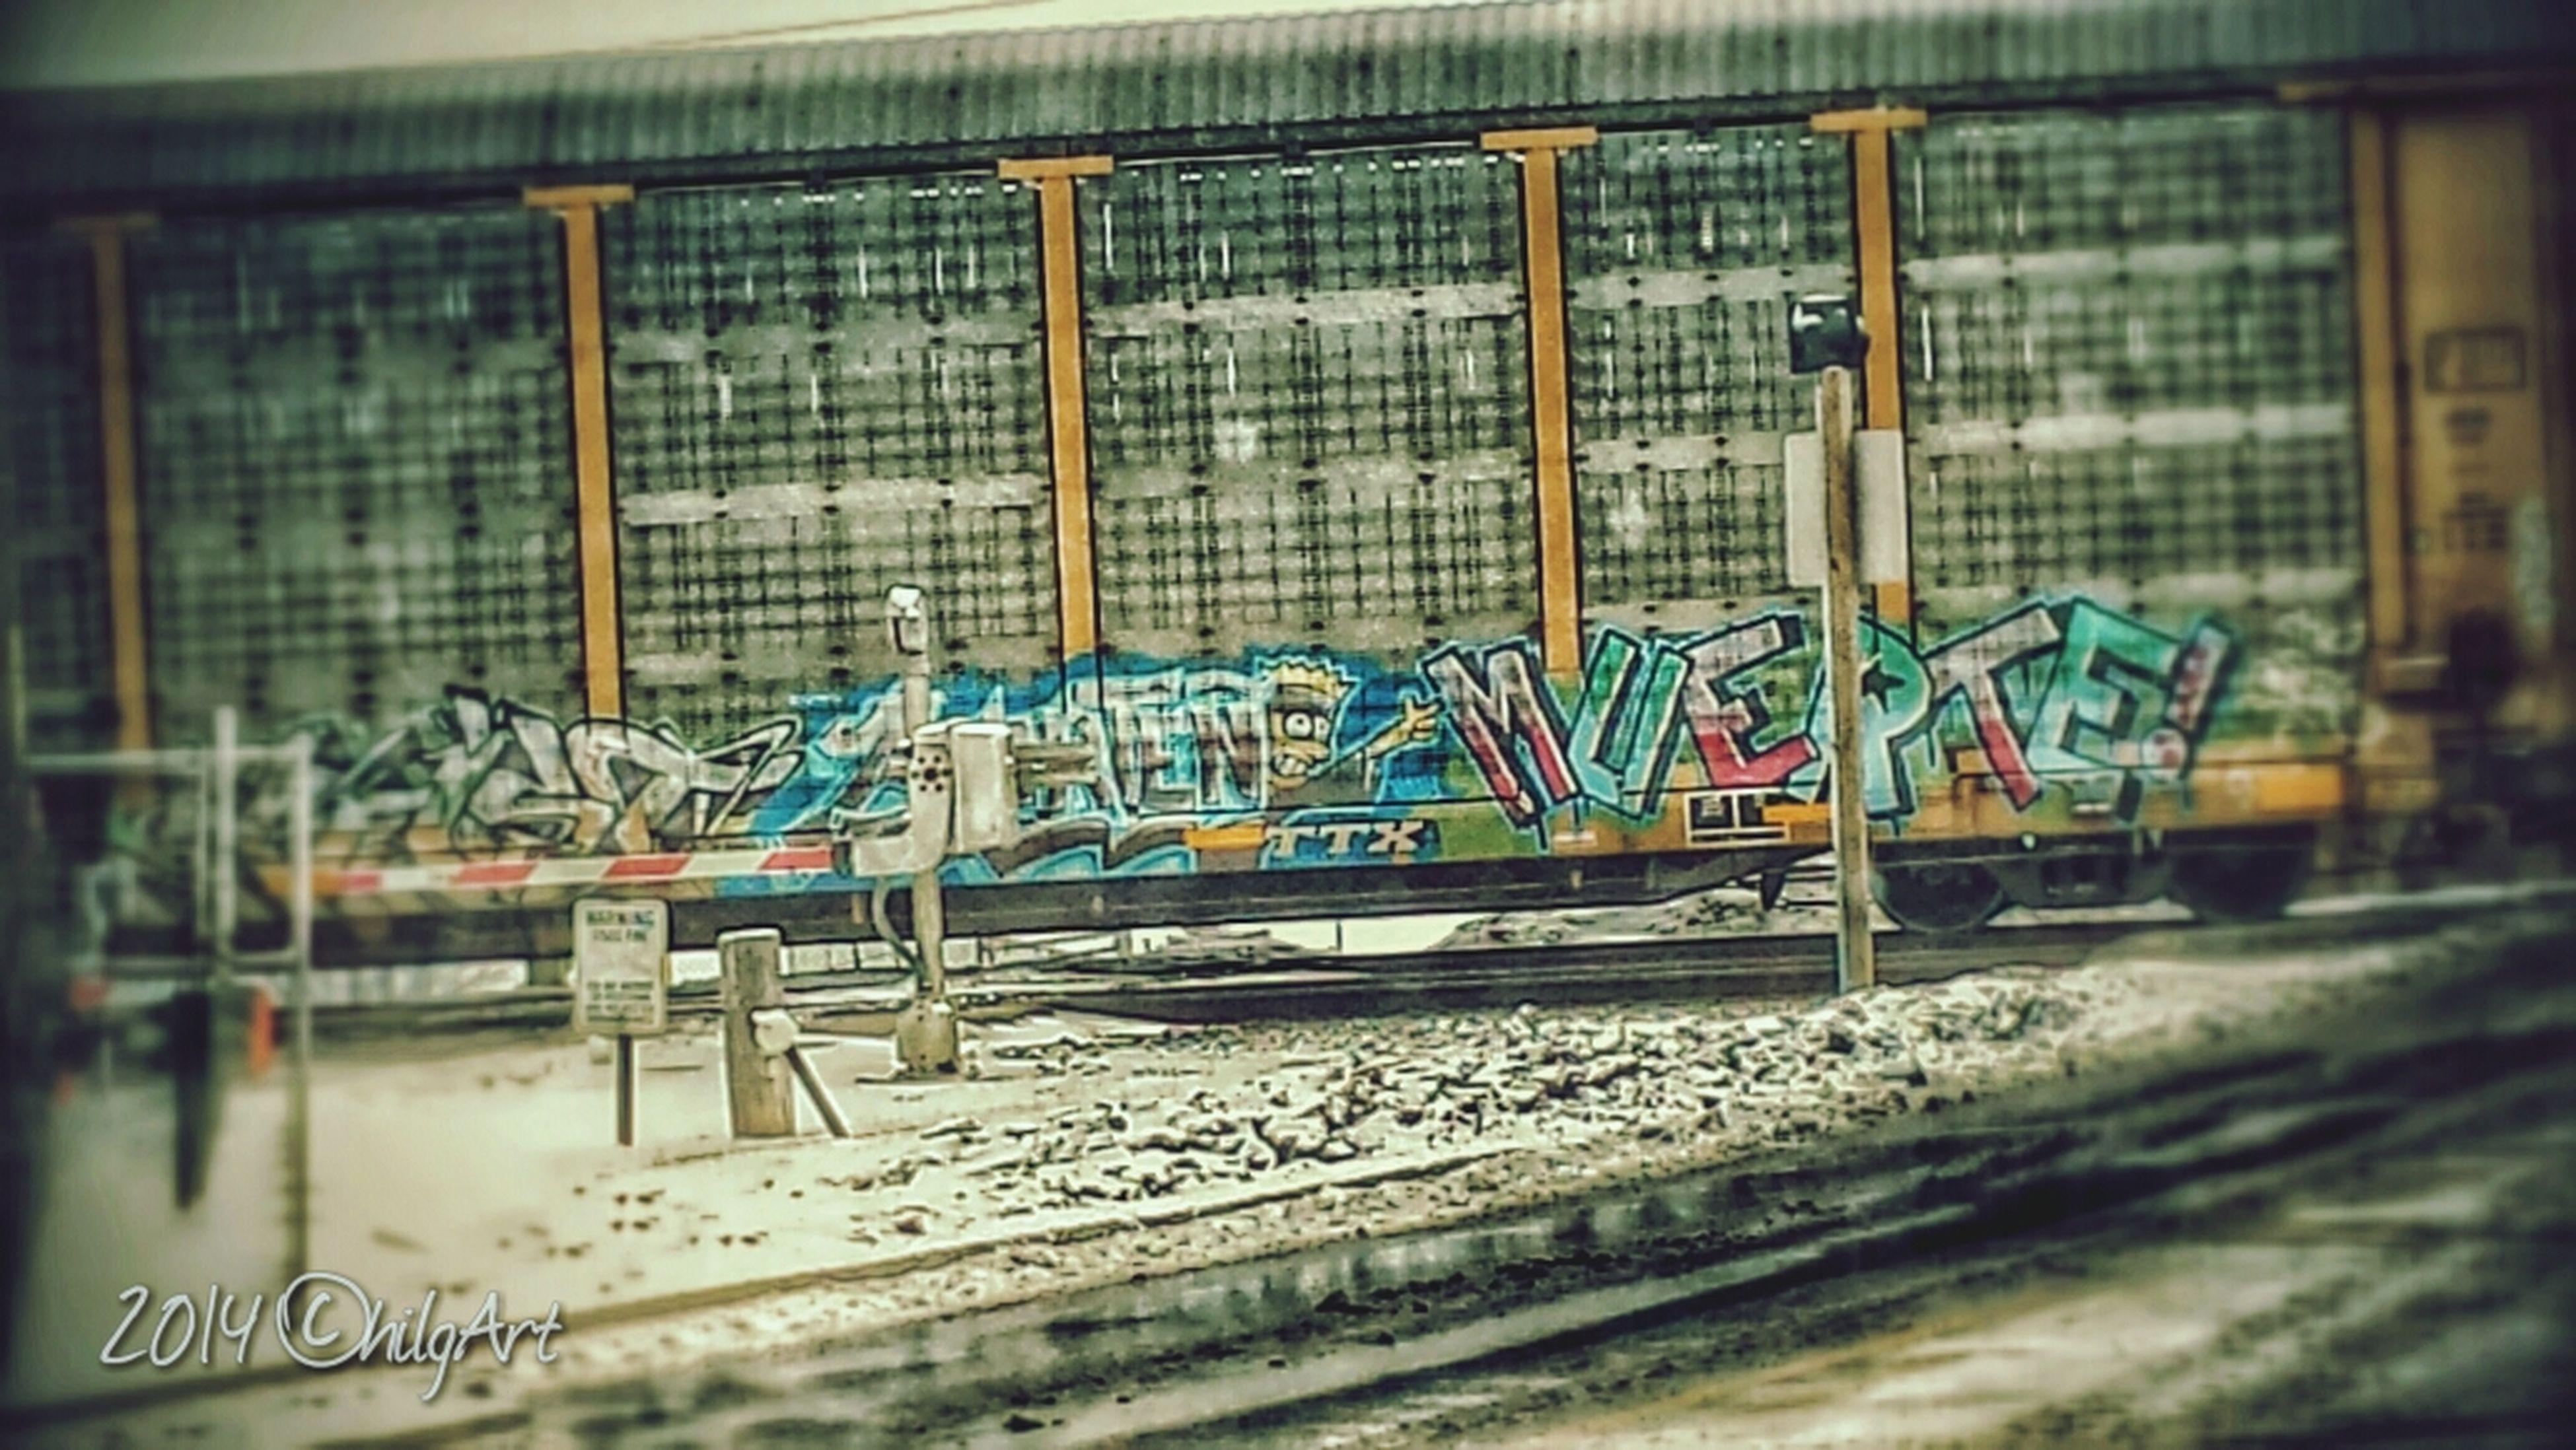 transportation, built structure, indoors, architecture, mode of transport, graffiti, metal, railing, day, empty, no people, absence, public transportation, metallic, land vehicle, window, railroad station platform, railroad station, train - vehicle